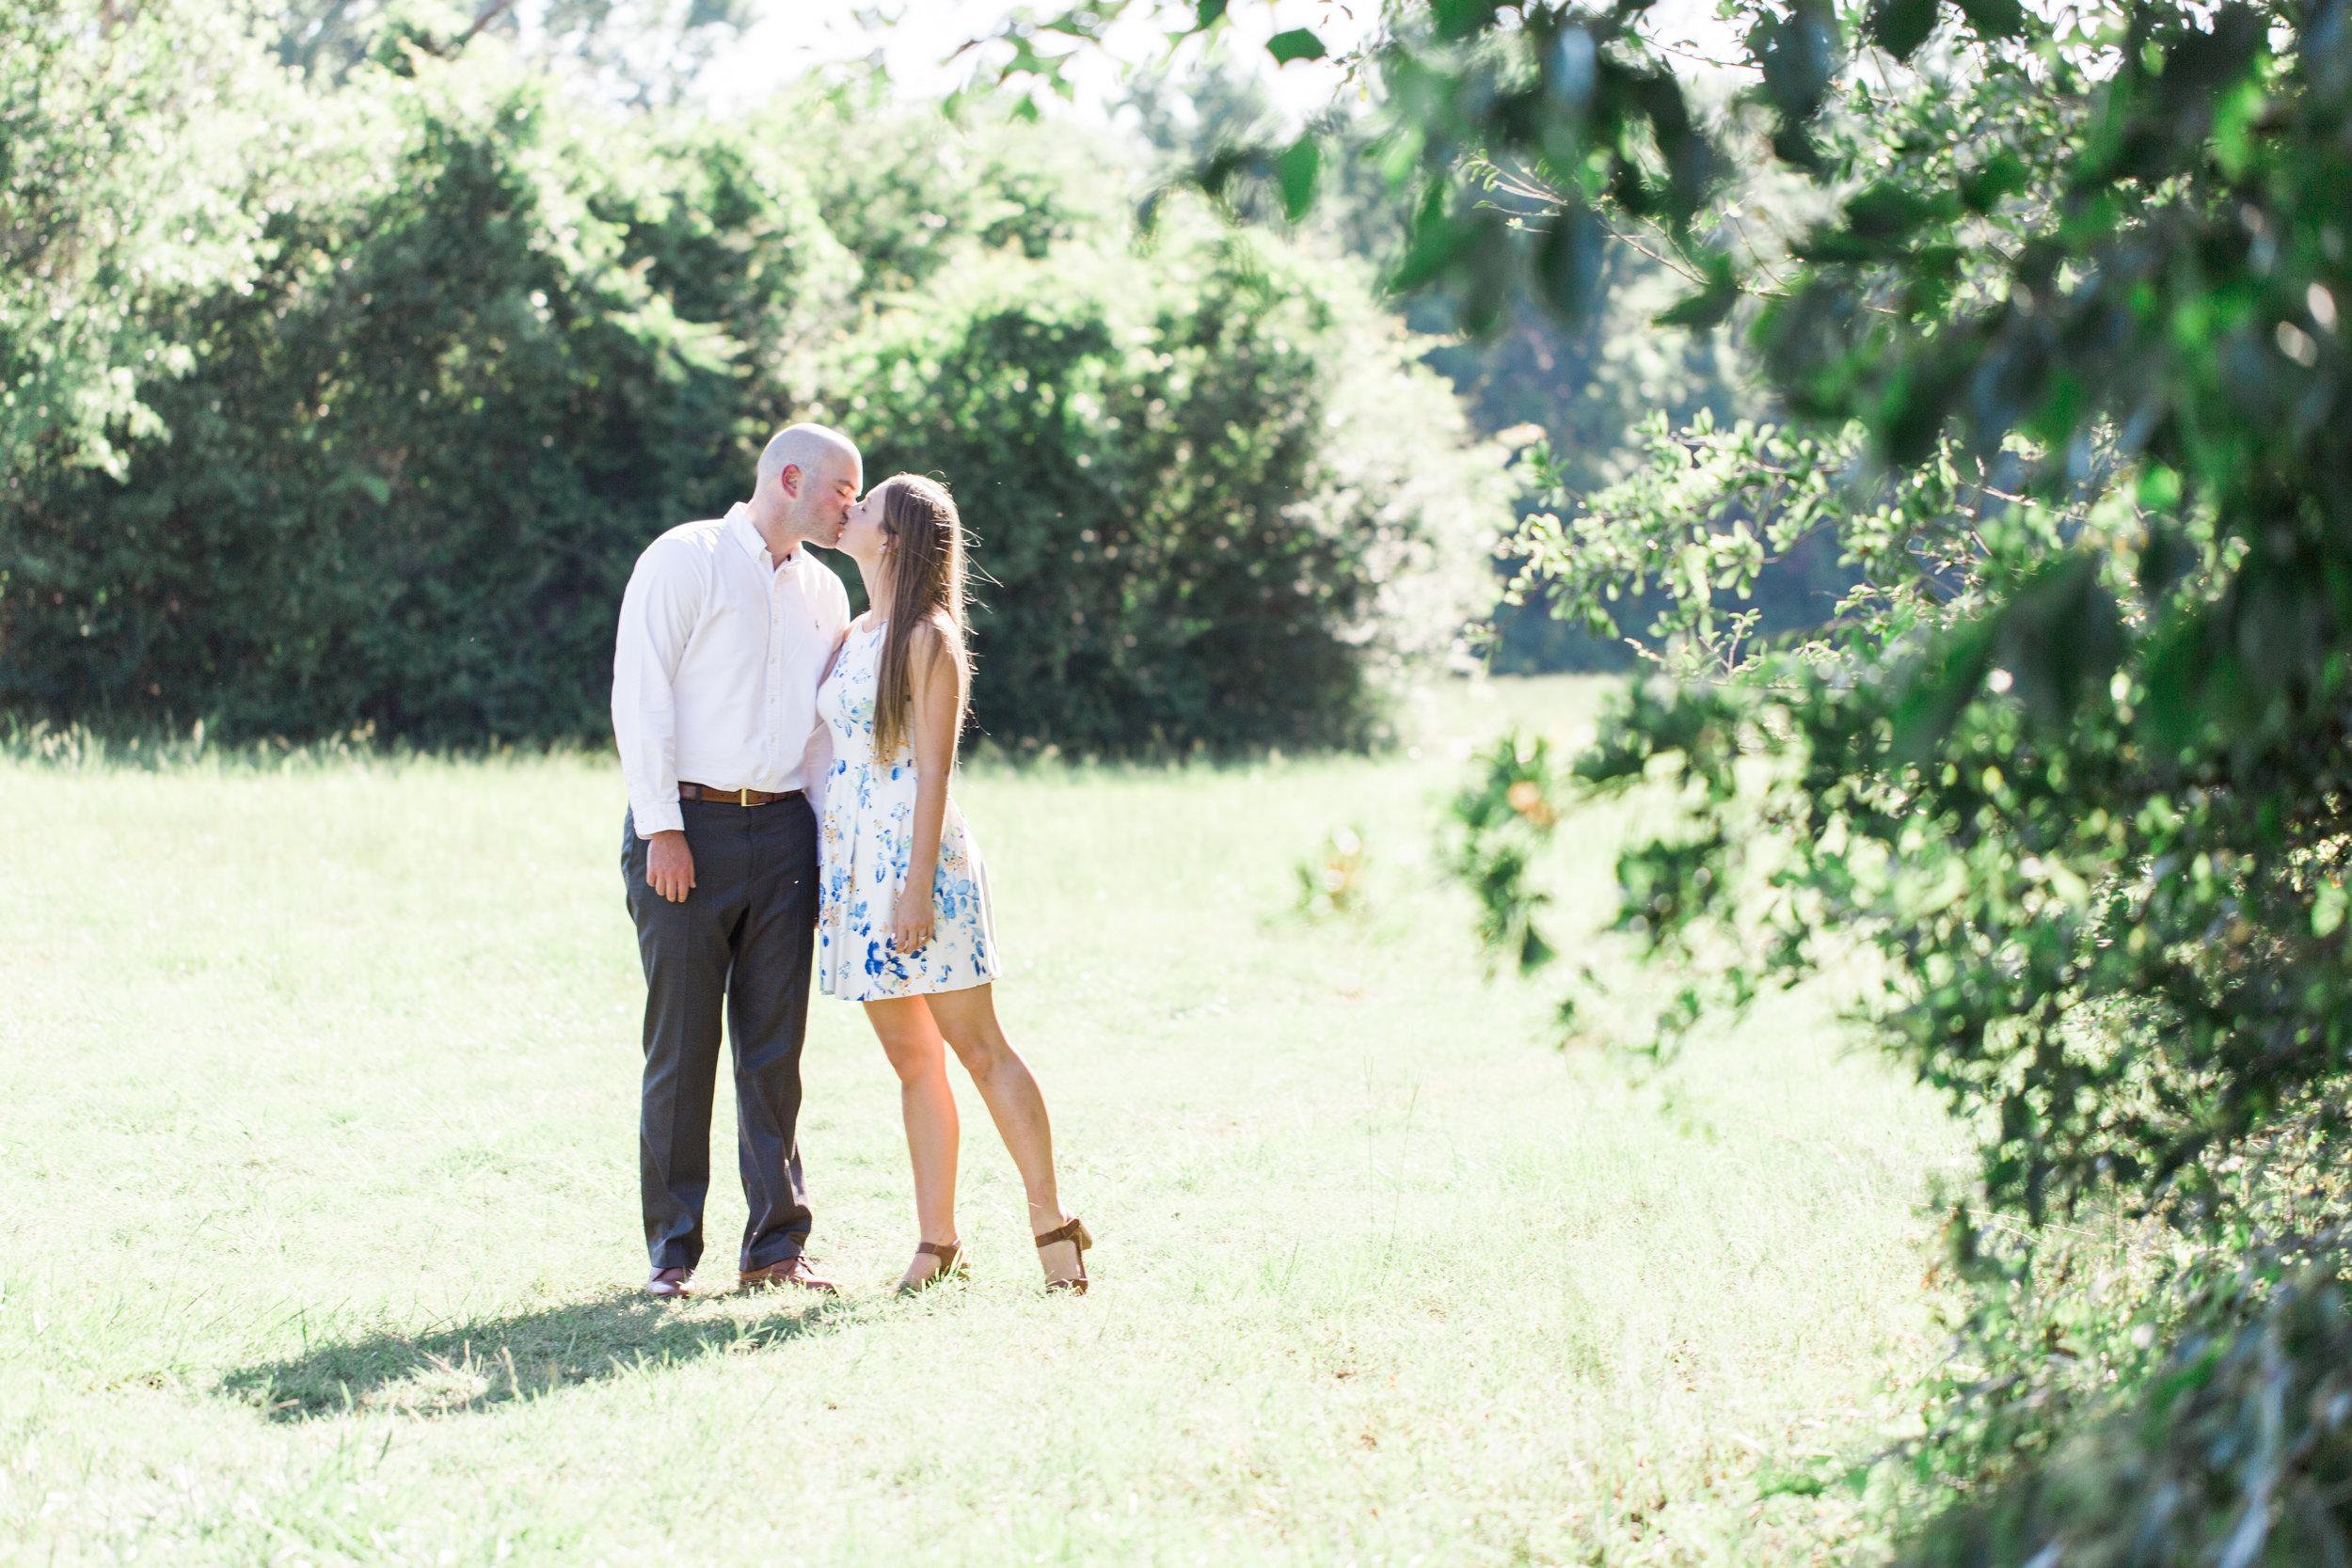 Alabama-Engagement-Photography-Montgomery-Nick-Drollette-Emily and Zakk-101.jpg